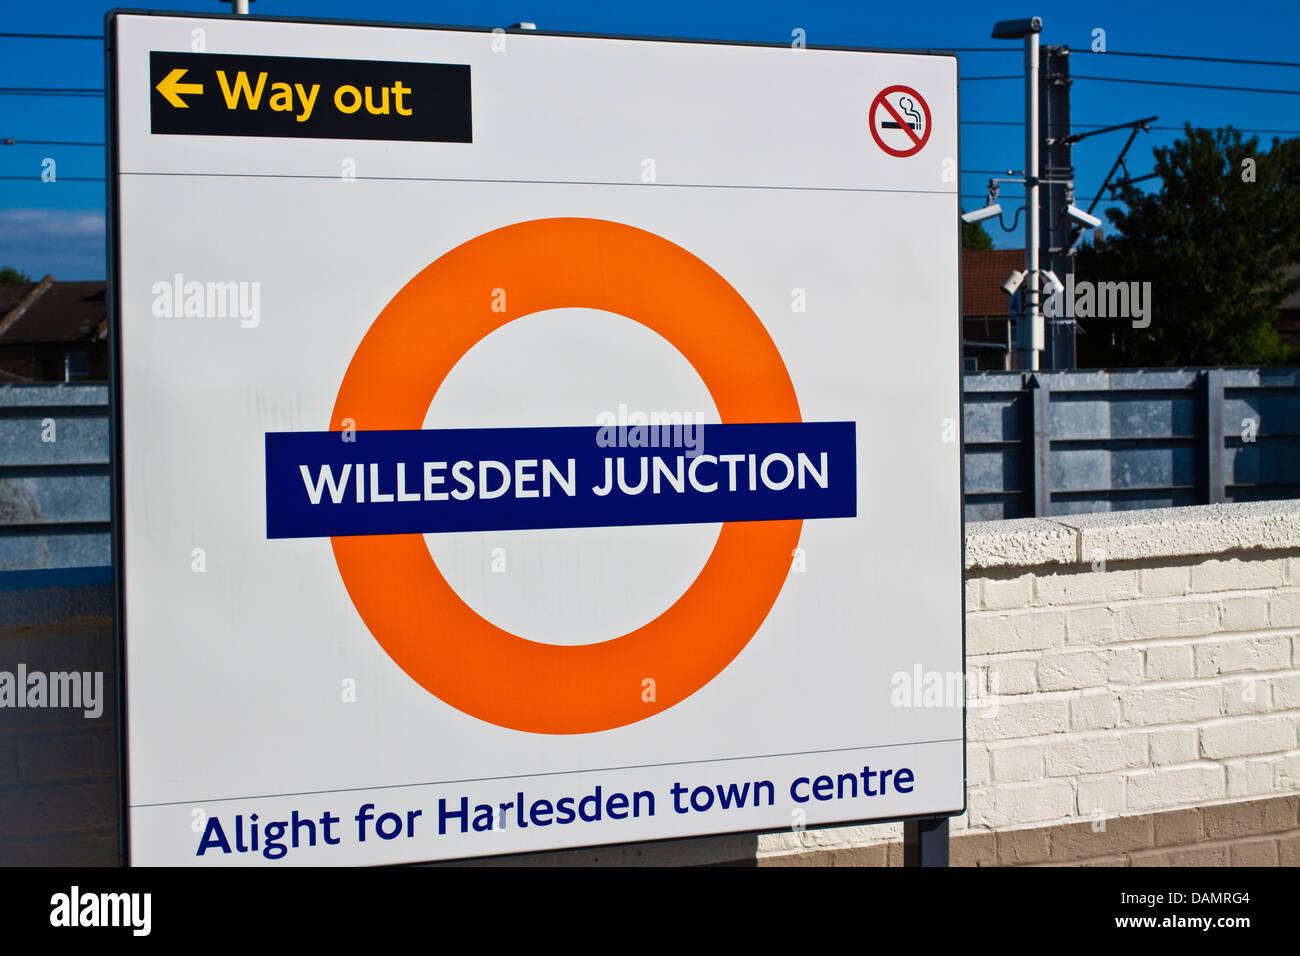 Willesden junction railway station - Stock Image